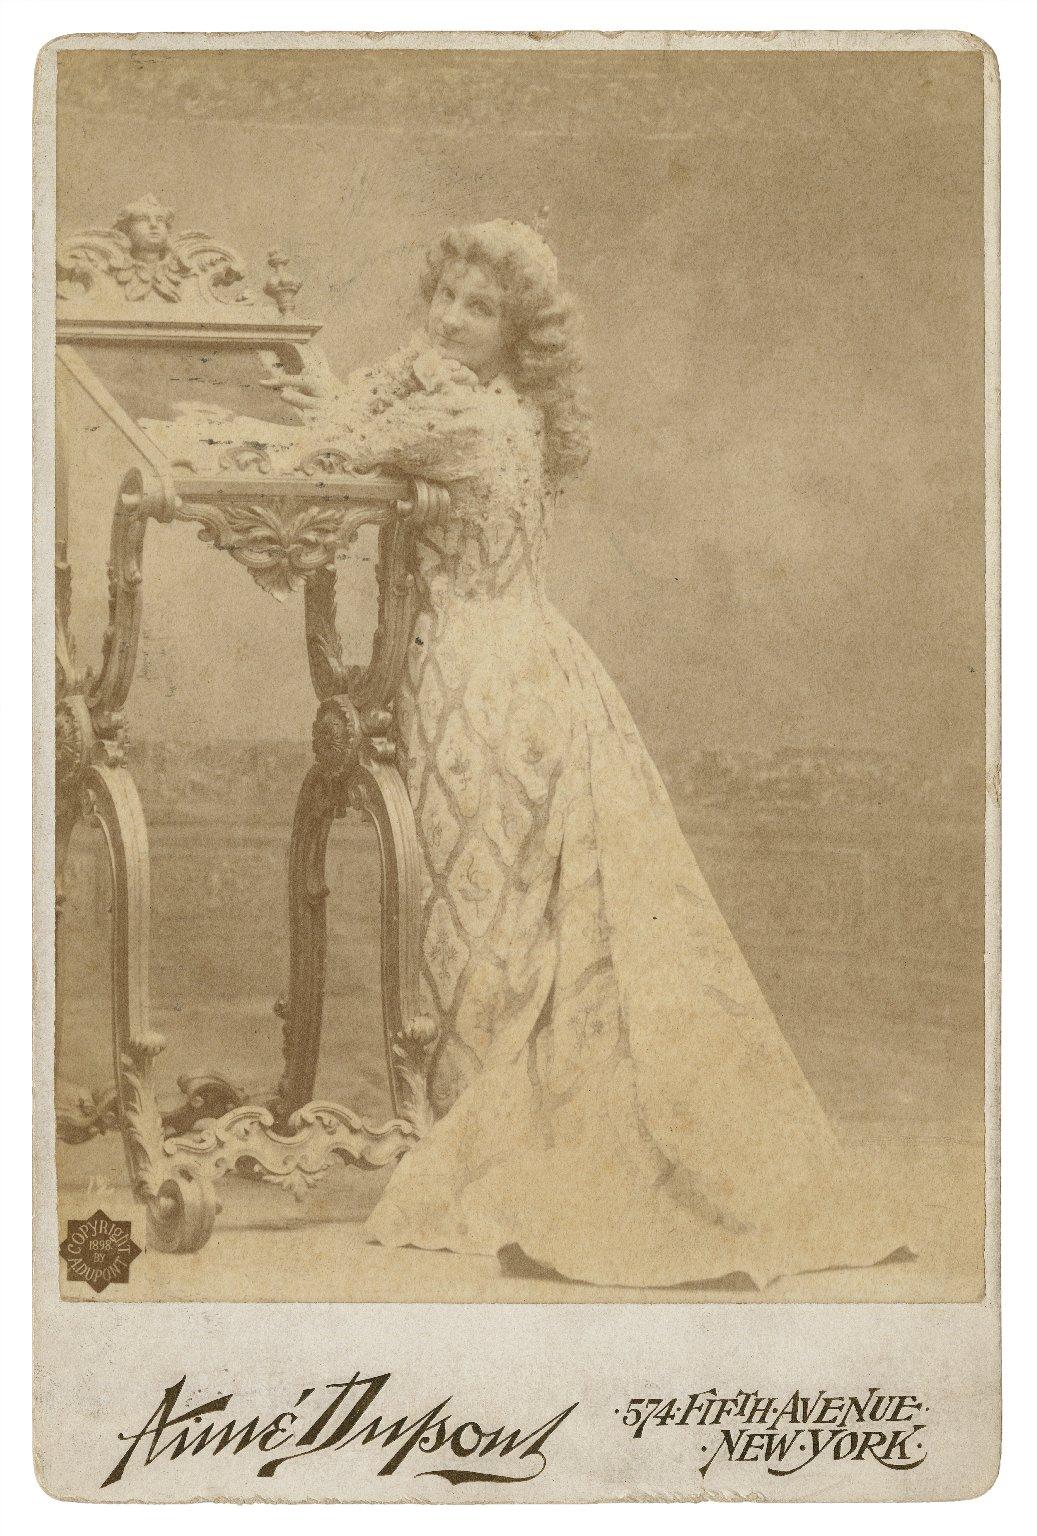 [Ada Rehan as Portia, in Shakespeare's The merchant of Venice] [graphic] / Aimé Dupont.